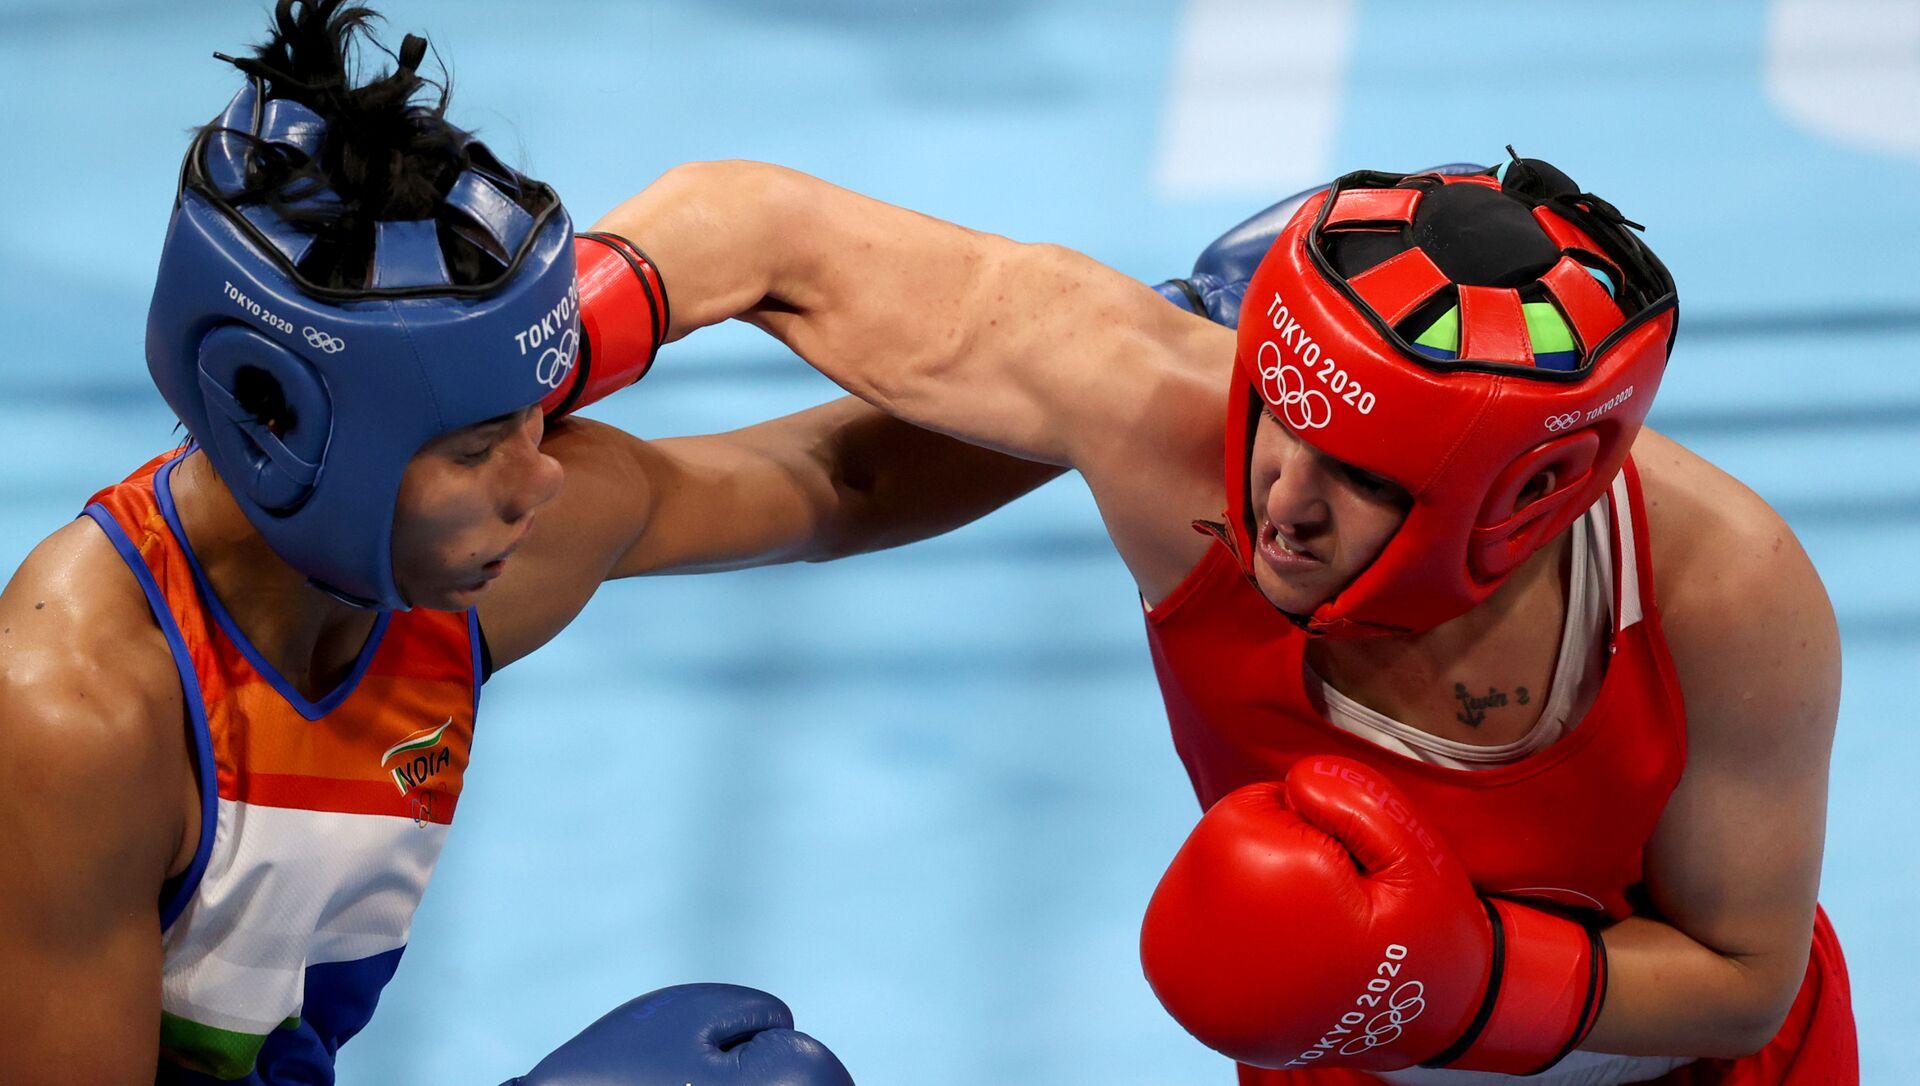 Tokyo 2020 Olympics -  Boxing - Women's Welterweight - Semifinal - Kokugikan Arena - Tokyo, Japan - 4 August 2021 - Busenaz Surmeneli of Turkey in action against Lovlina Borgohain of India  - Sputnik International, 1920, 04.08.2021